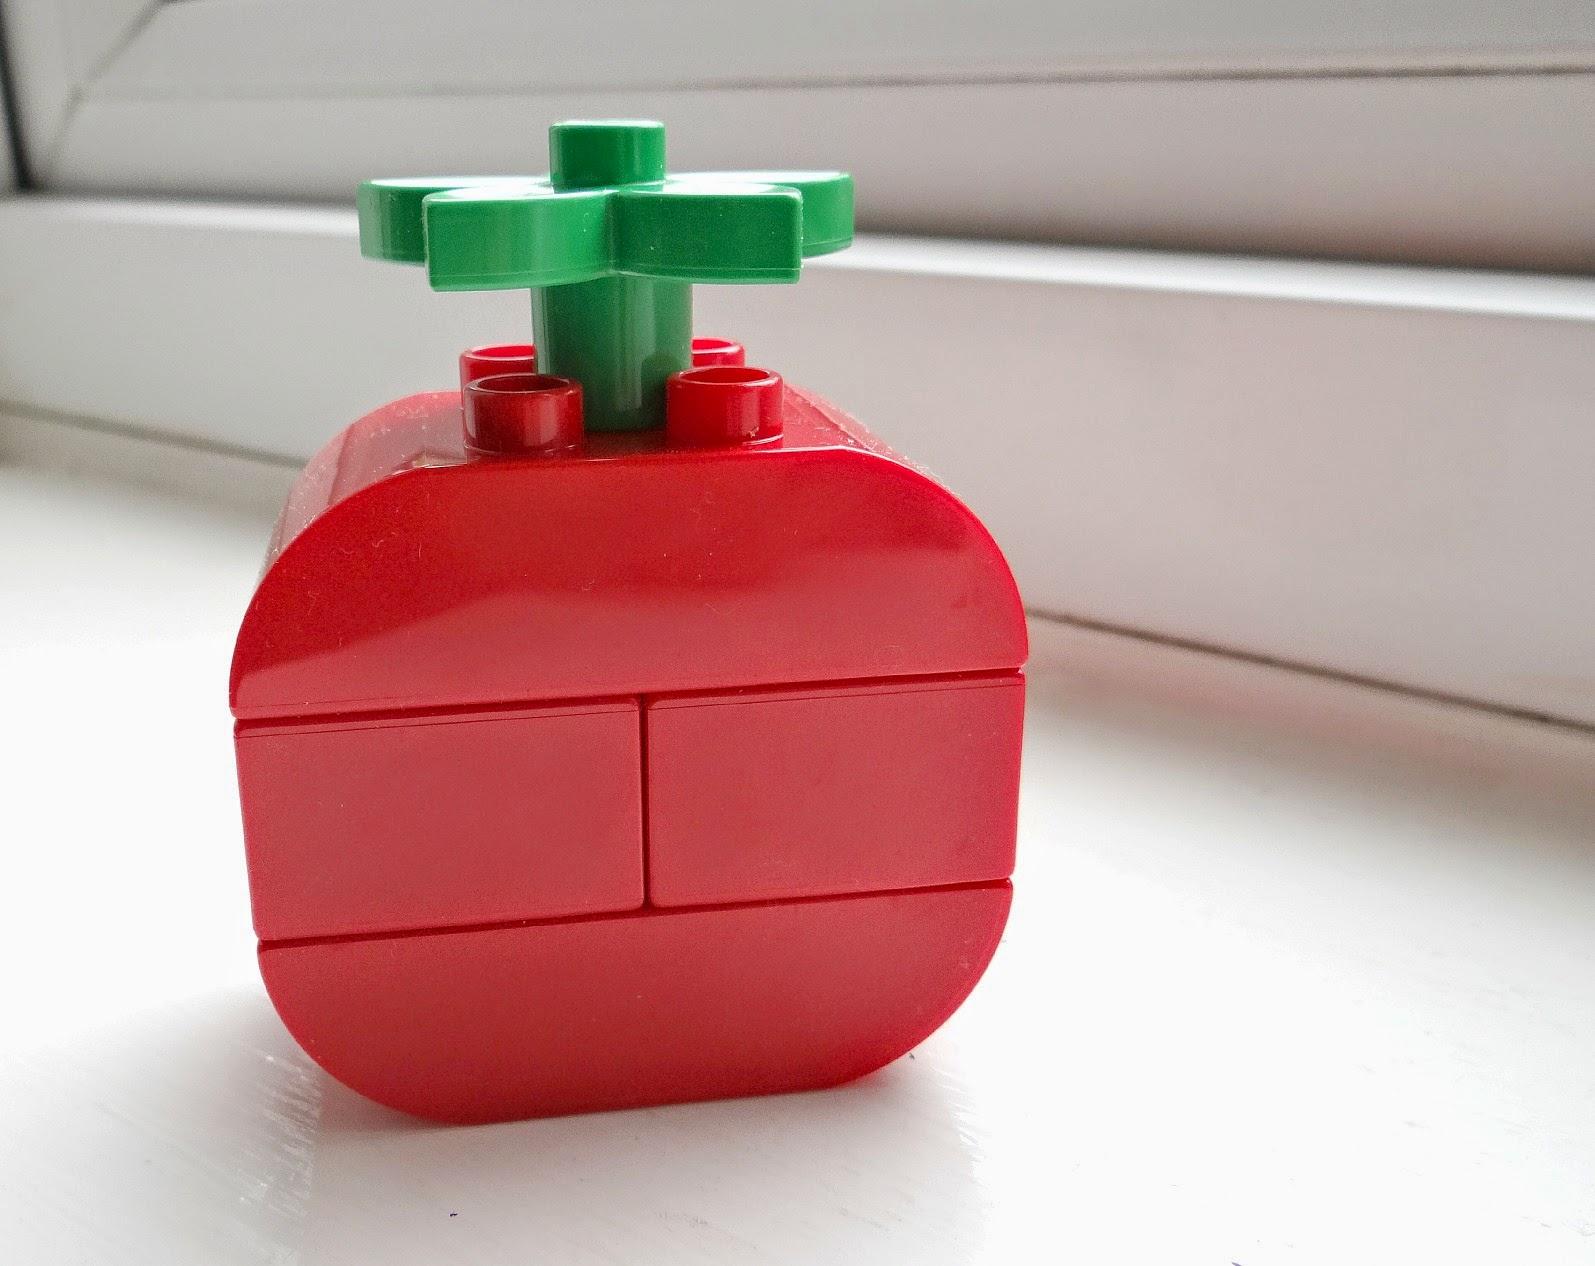 LEGO, Free LEGO Duplo Apple, LEGO Duplo